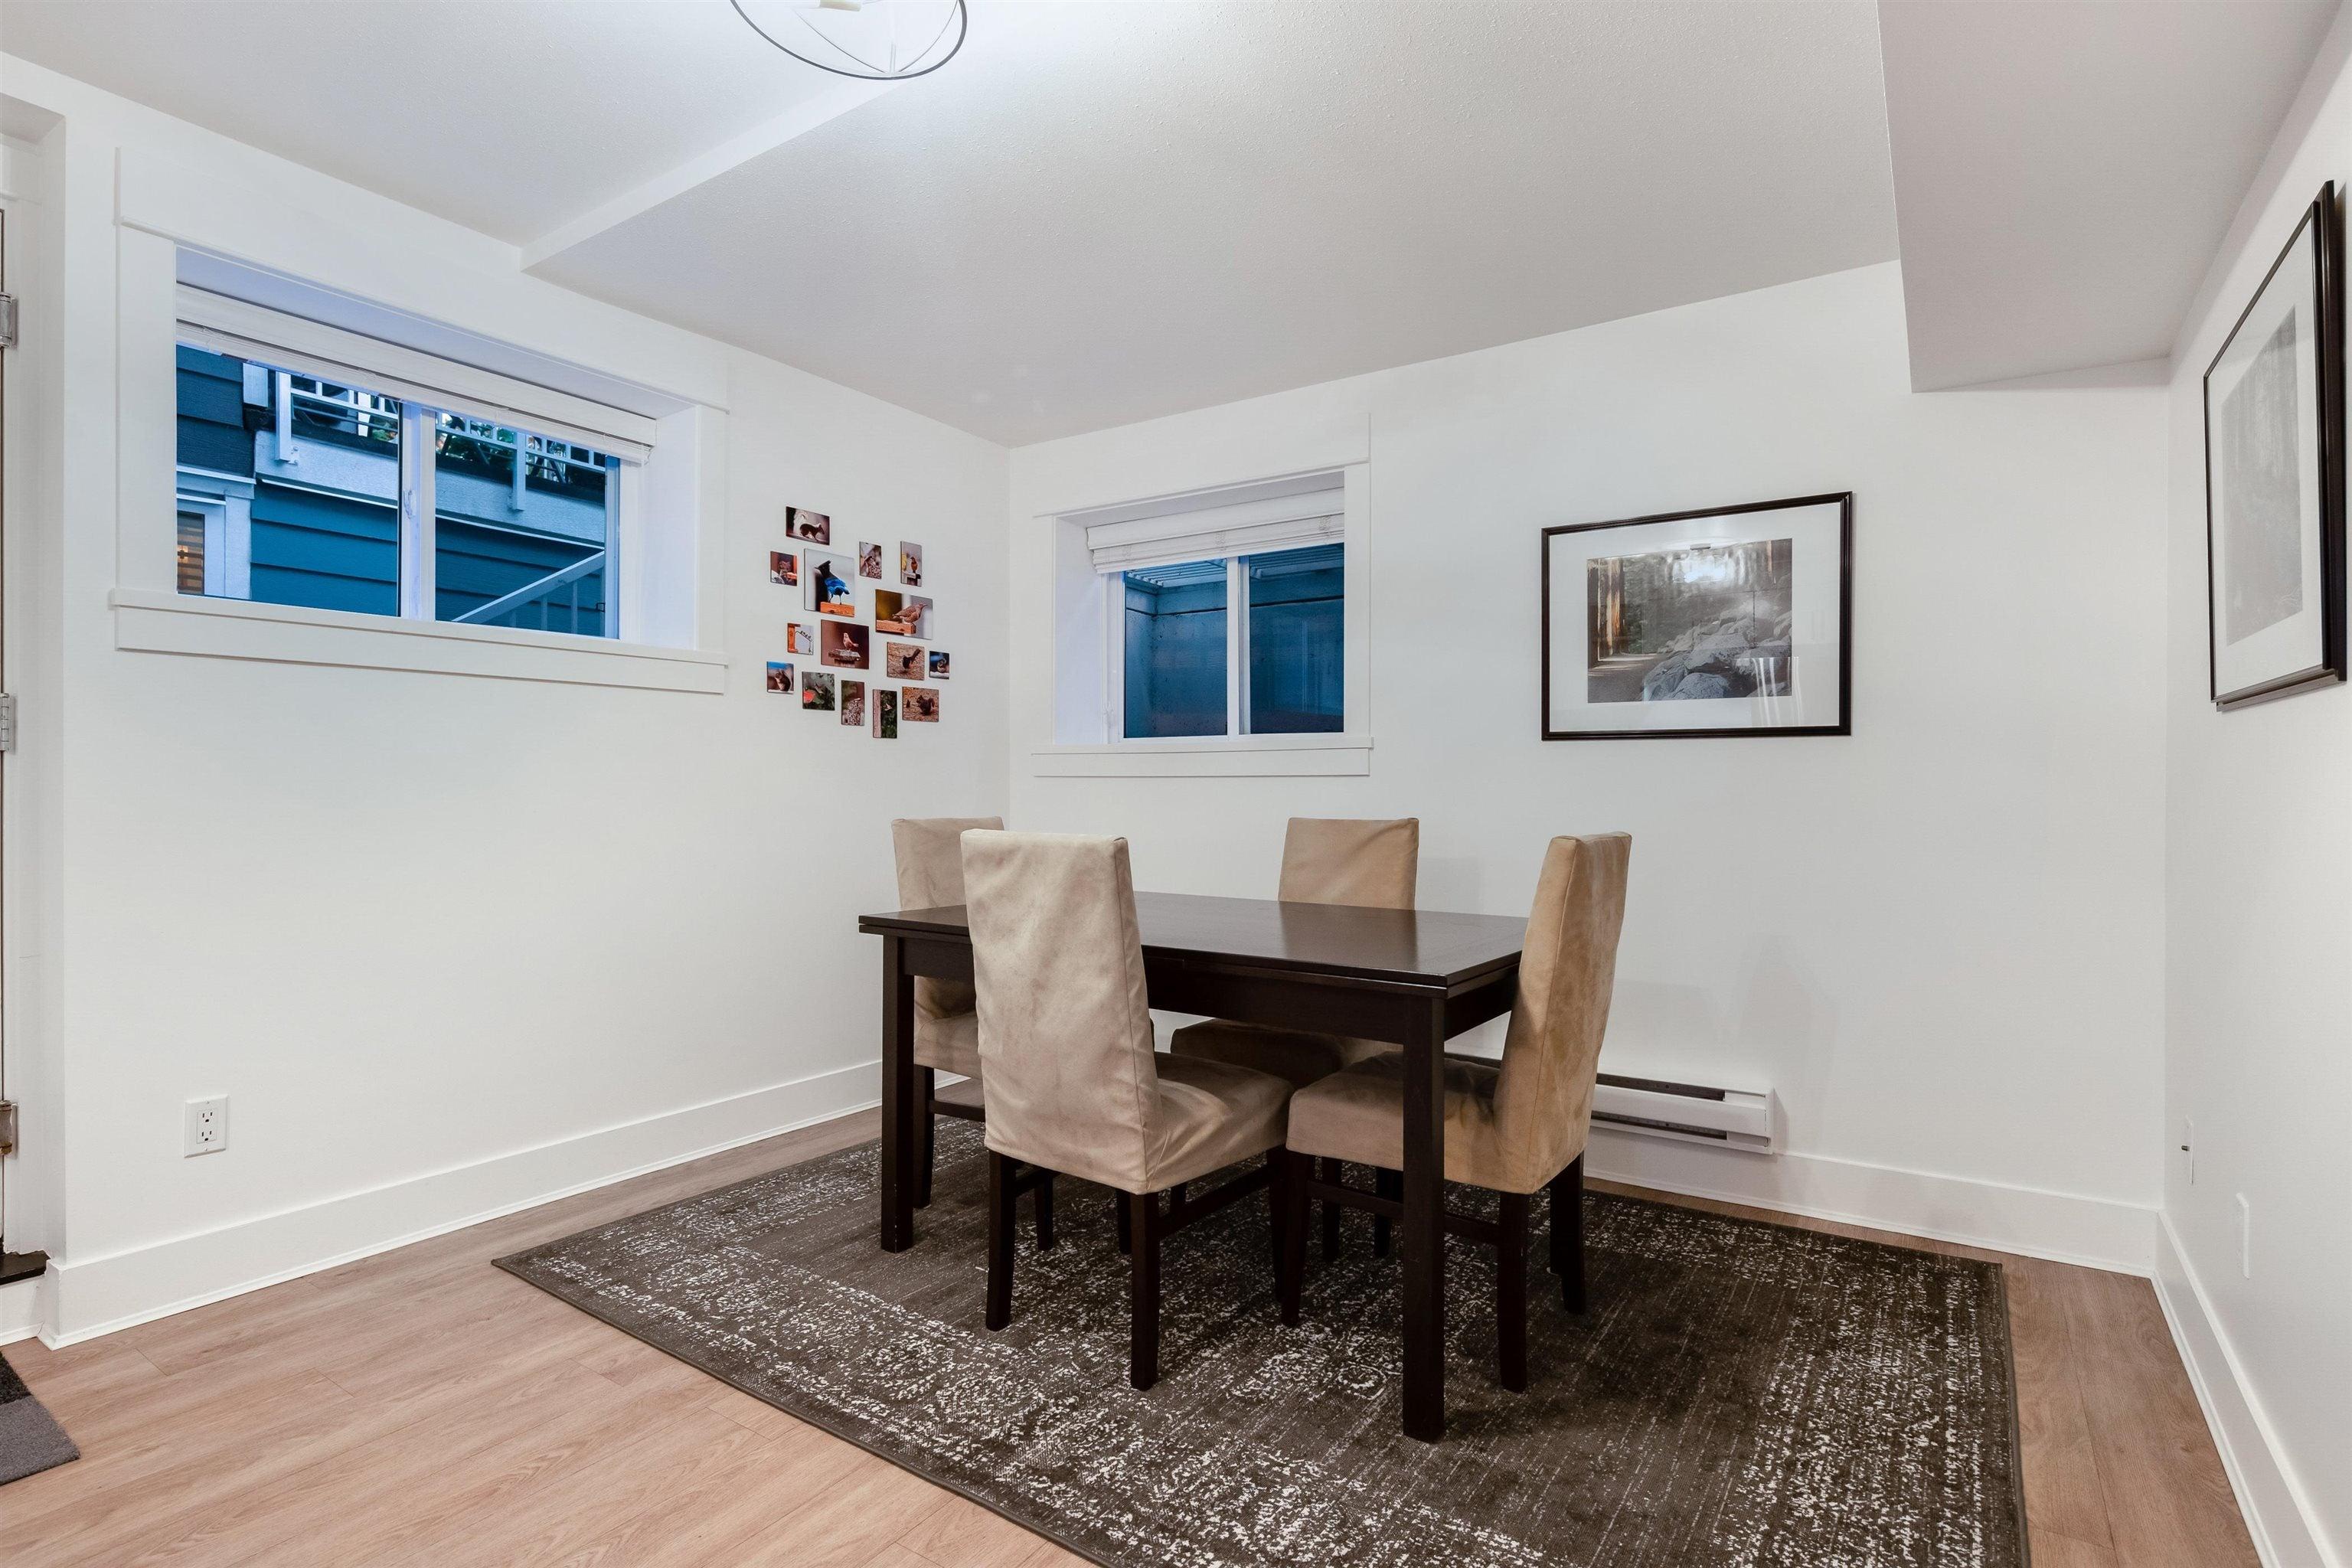 2258 WINDRIDGE DRIVE - Seymour NV House/Single Family for sale, 5 Bedrooms (R2617156) - #30